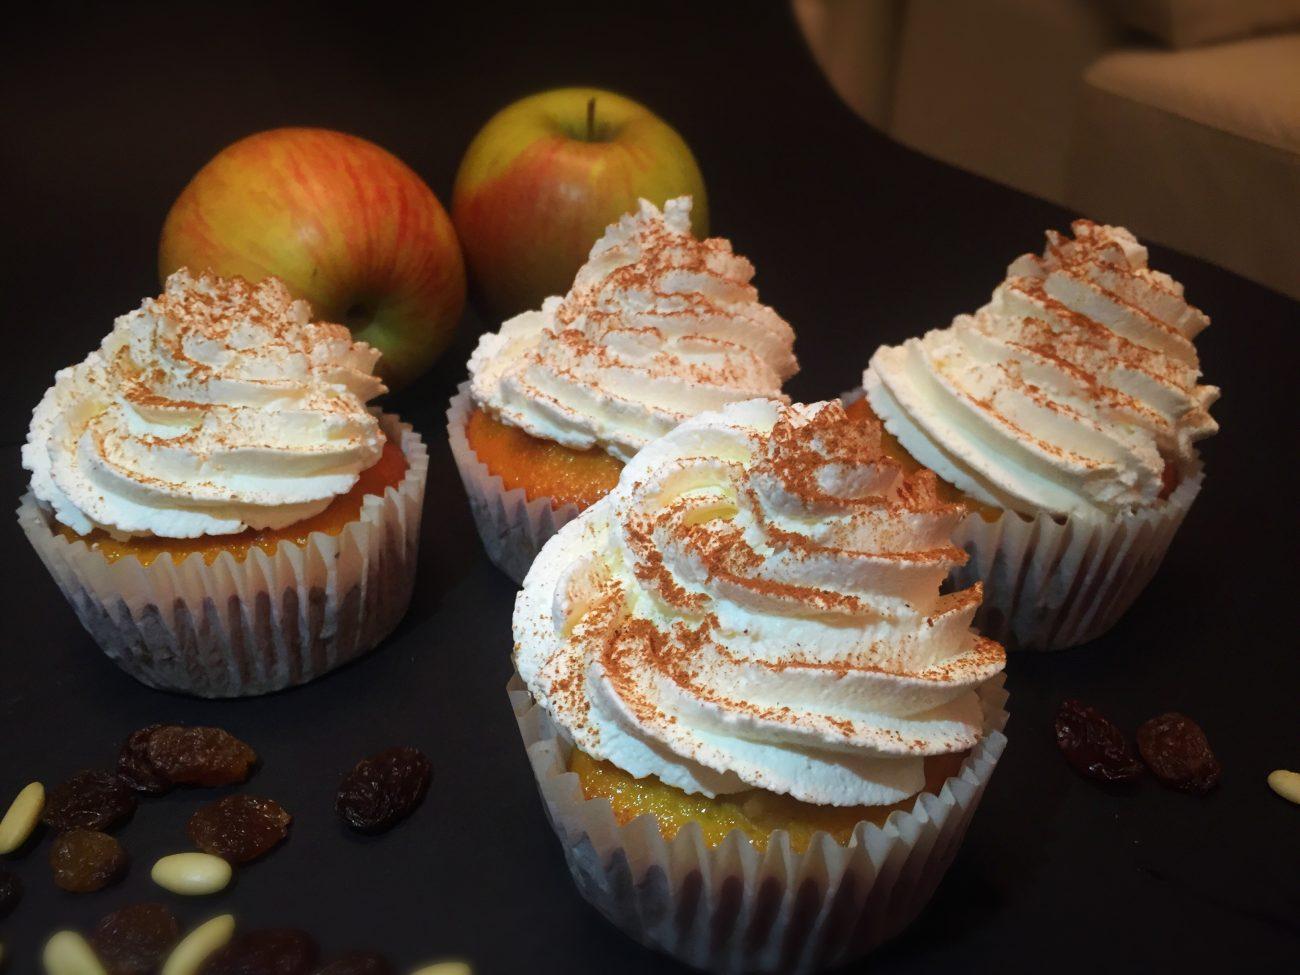 Strudel Cupcakes